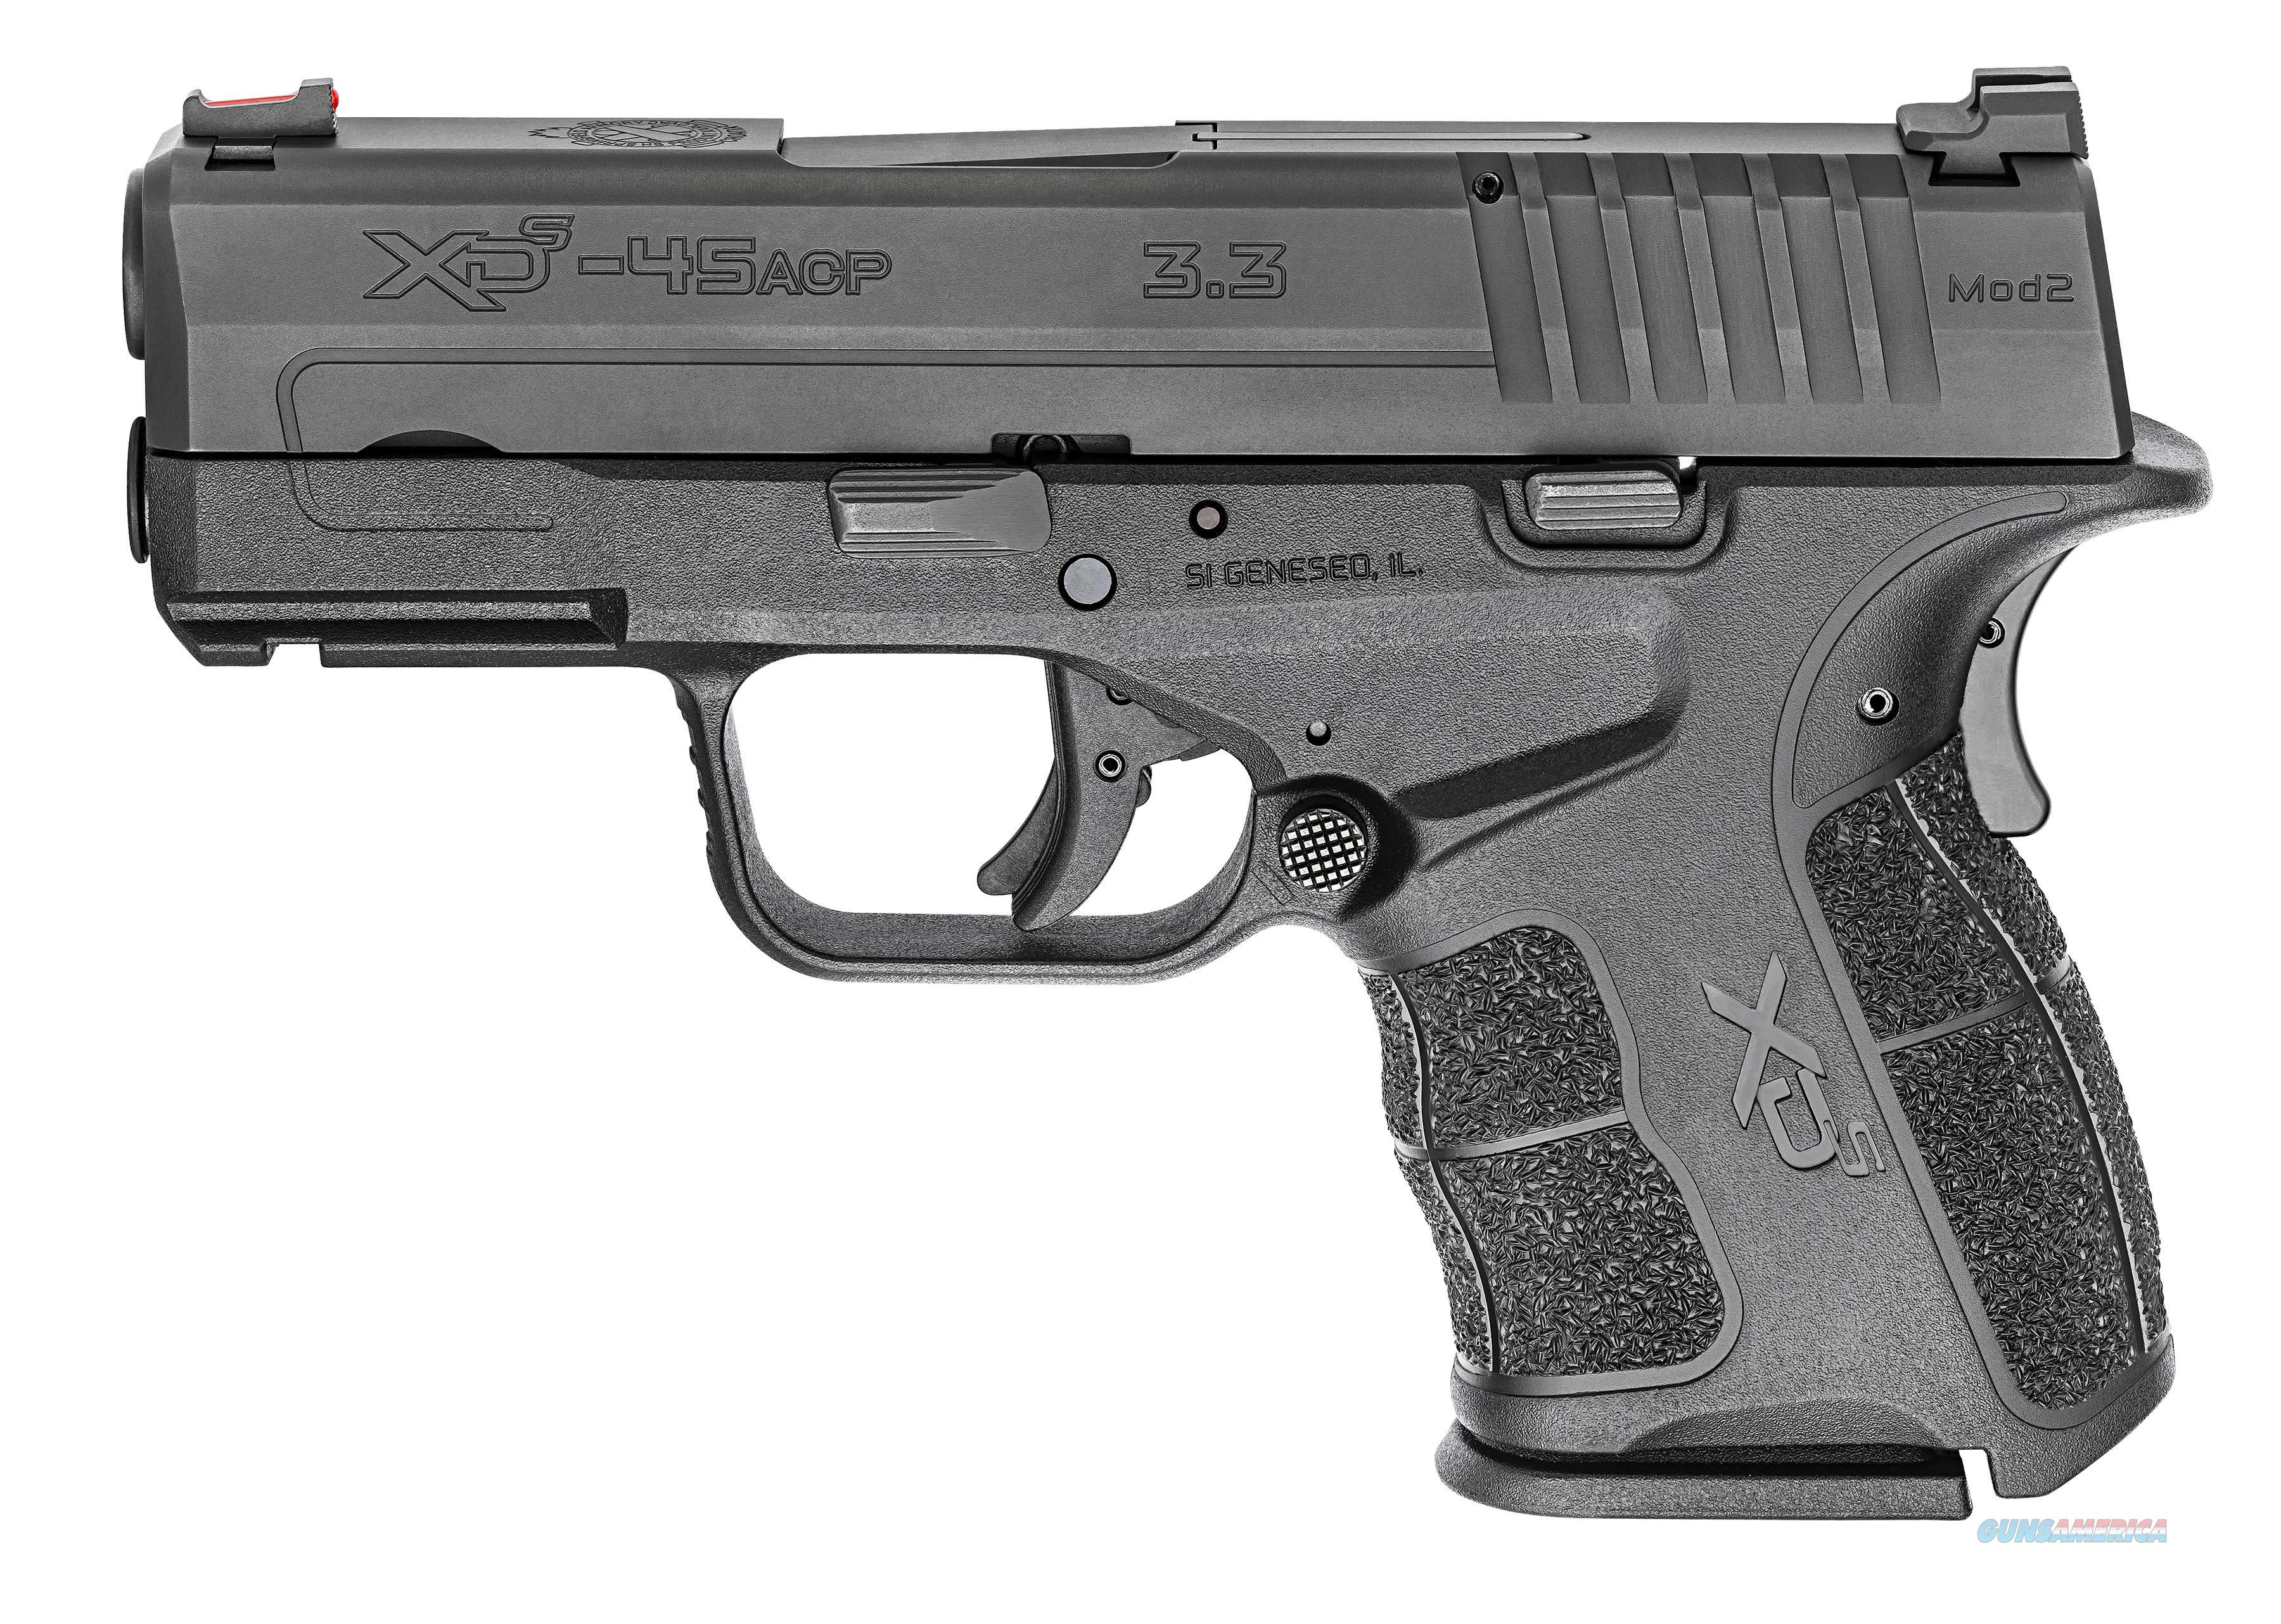 "Springfield Armory XDSG93345BT XD-S Mod.2 45 Automatic Colt Pistol (ACP) Double 3.3"" 5+1/6+1 TNS  Guns > Pistols > Springfield Armory Pistols > XD-S"